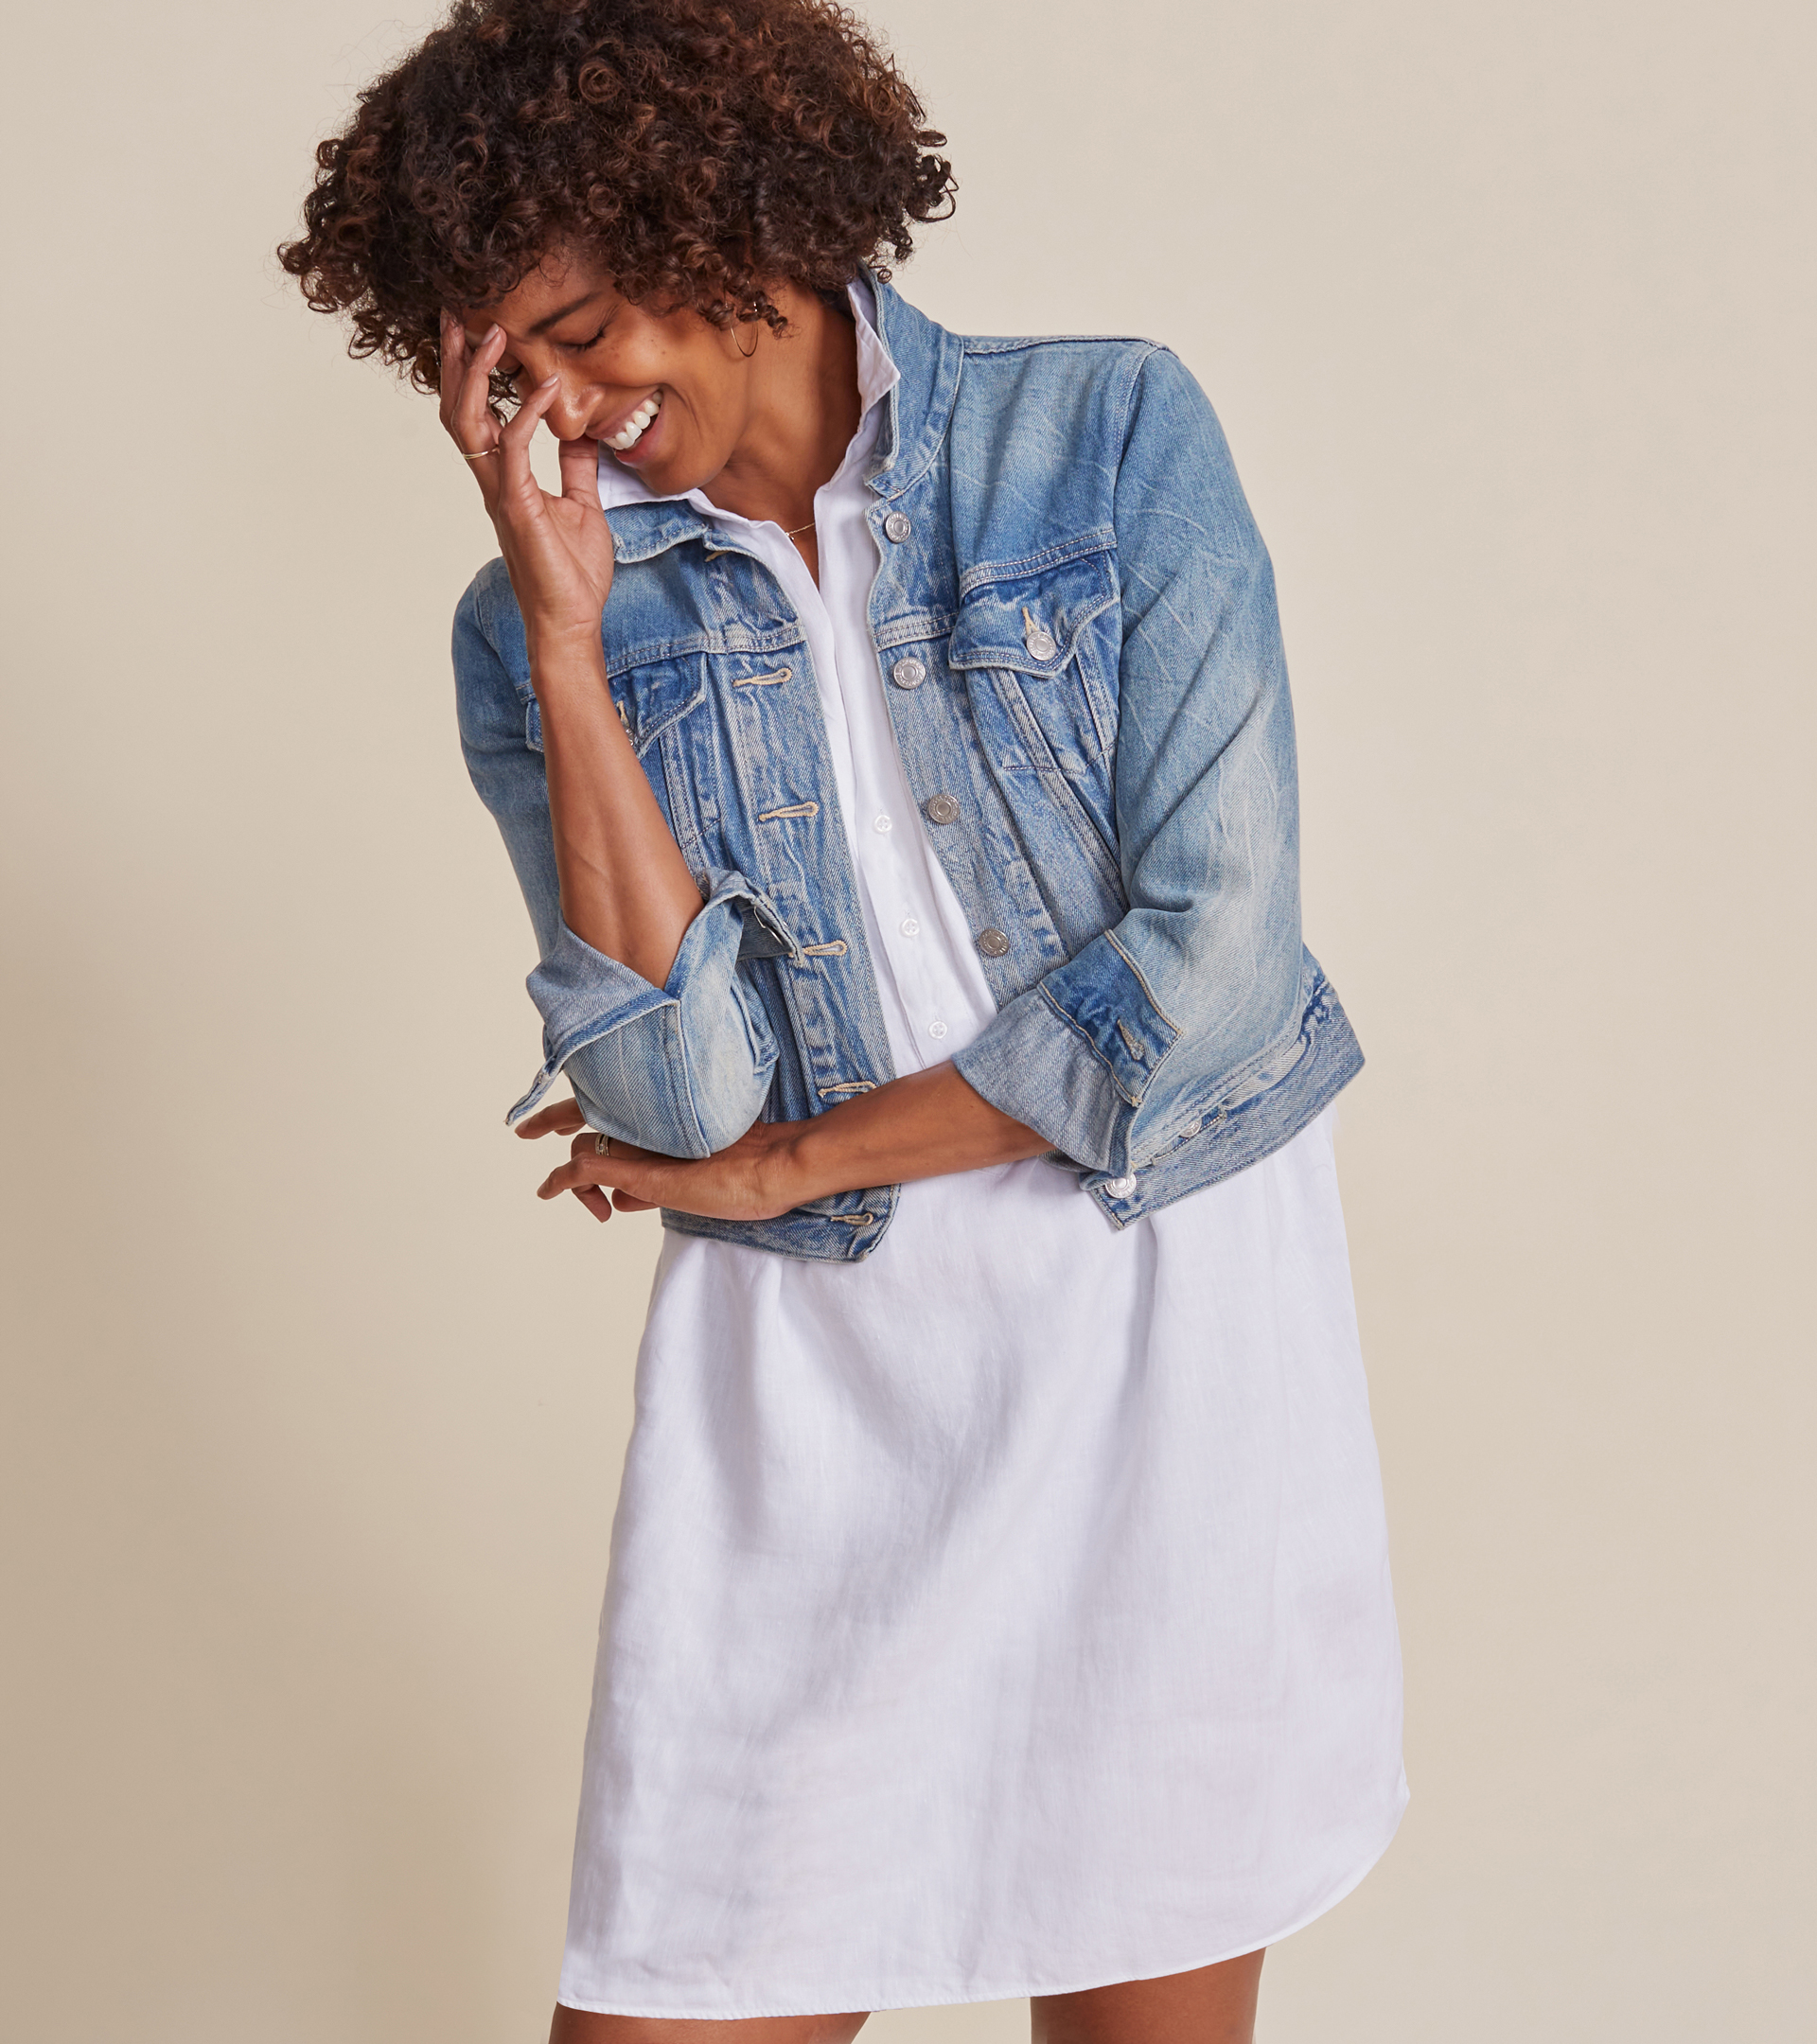 Image of The Artist Short Sleeve Dress White, Tumbled Linen Final Sale